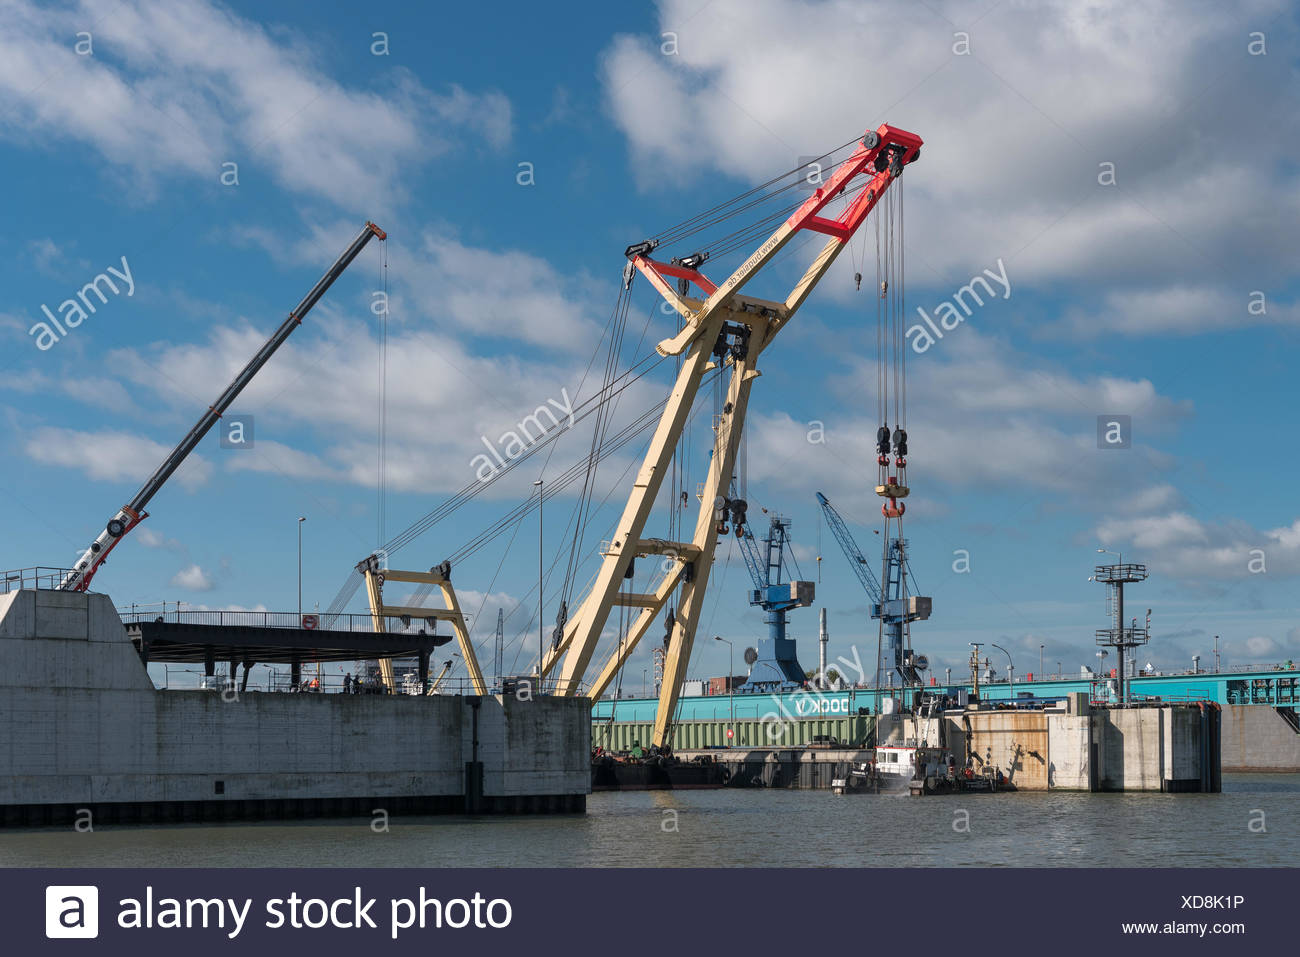 Schiffsschleuse Stock Photos & Schiffsschleuse Stock Images - Alamy